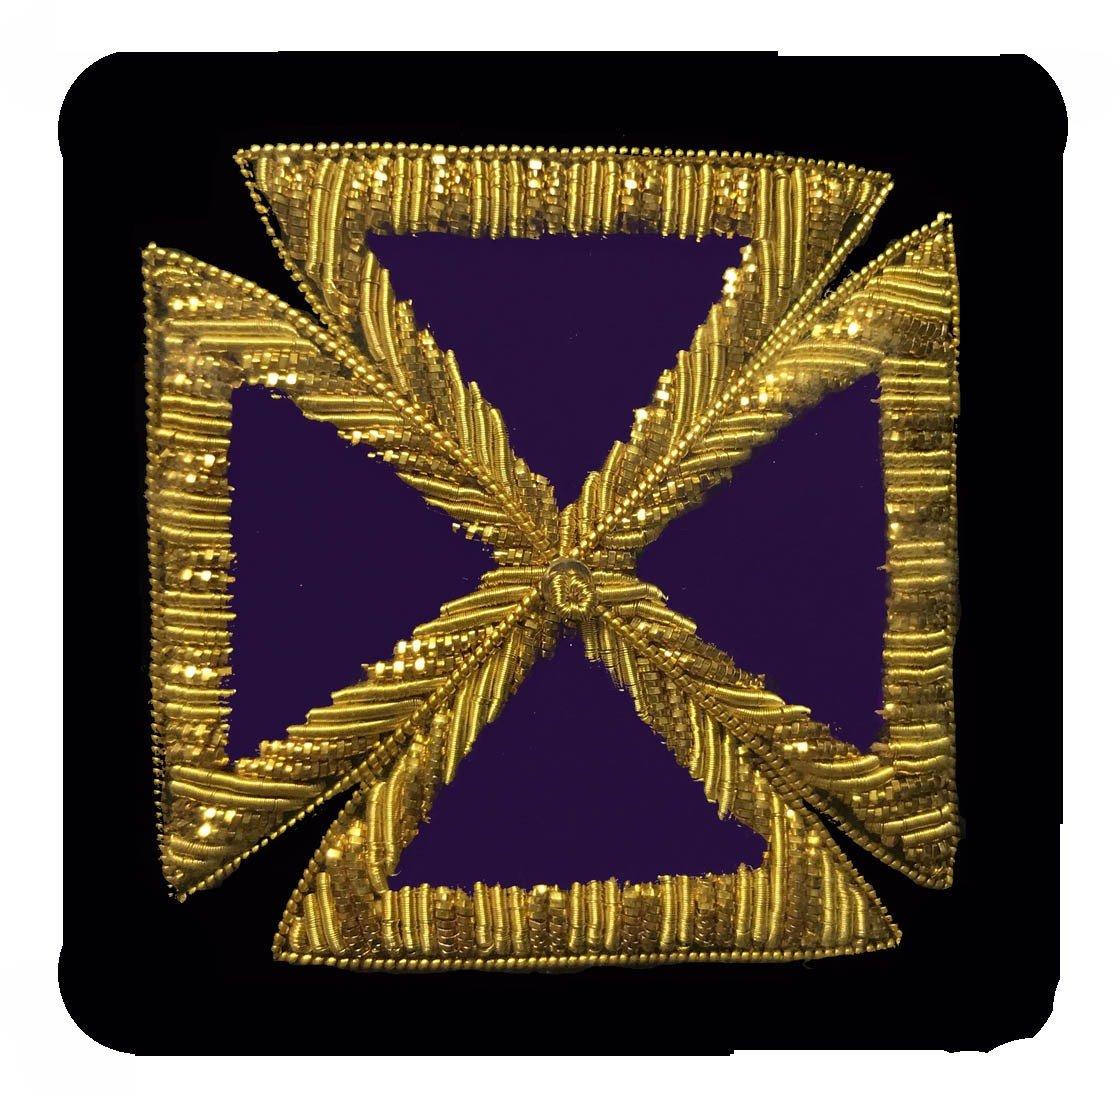 Embroidered Sleeve Rank PGC  (Gold Bullion) pair